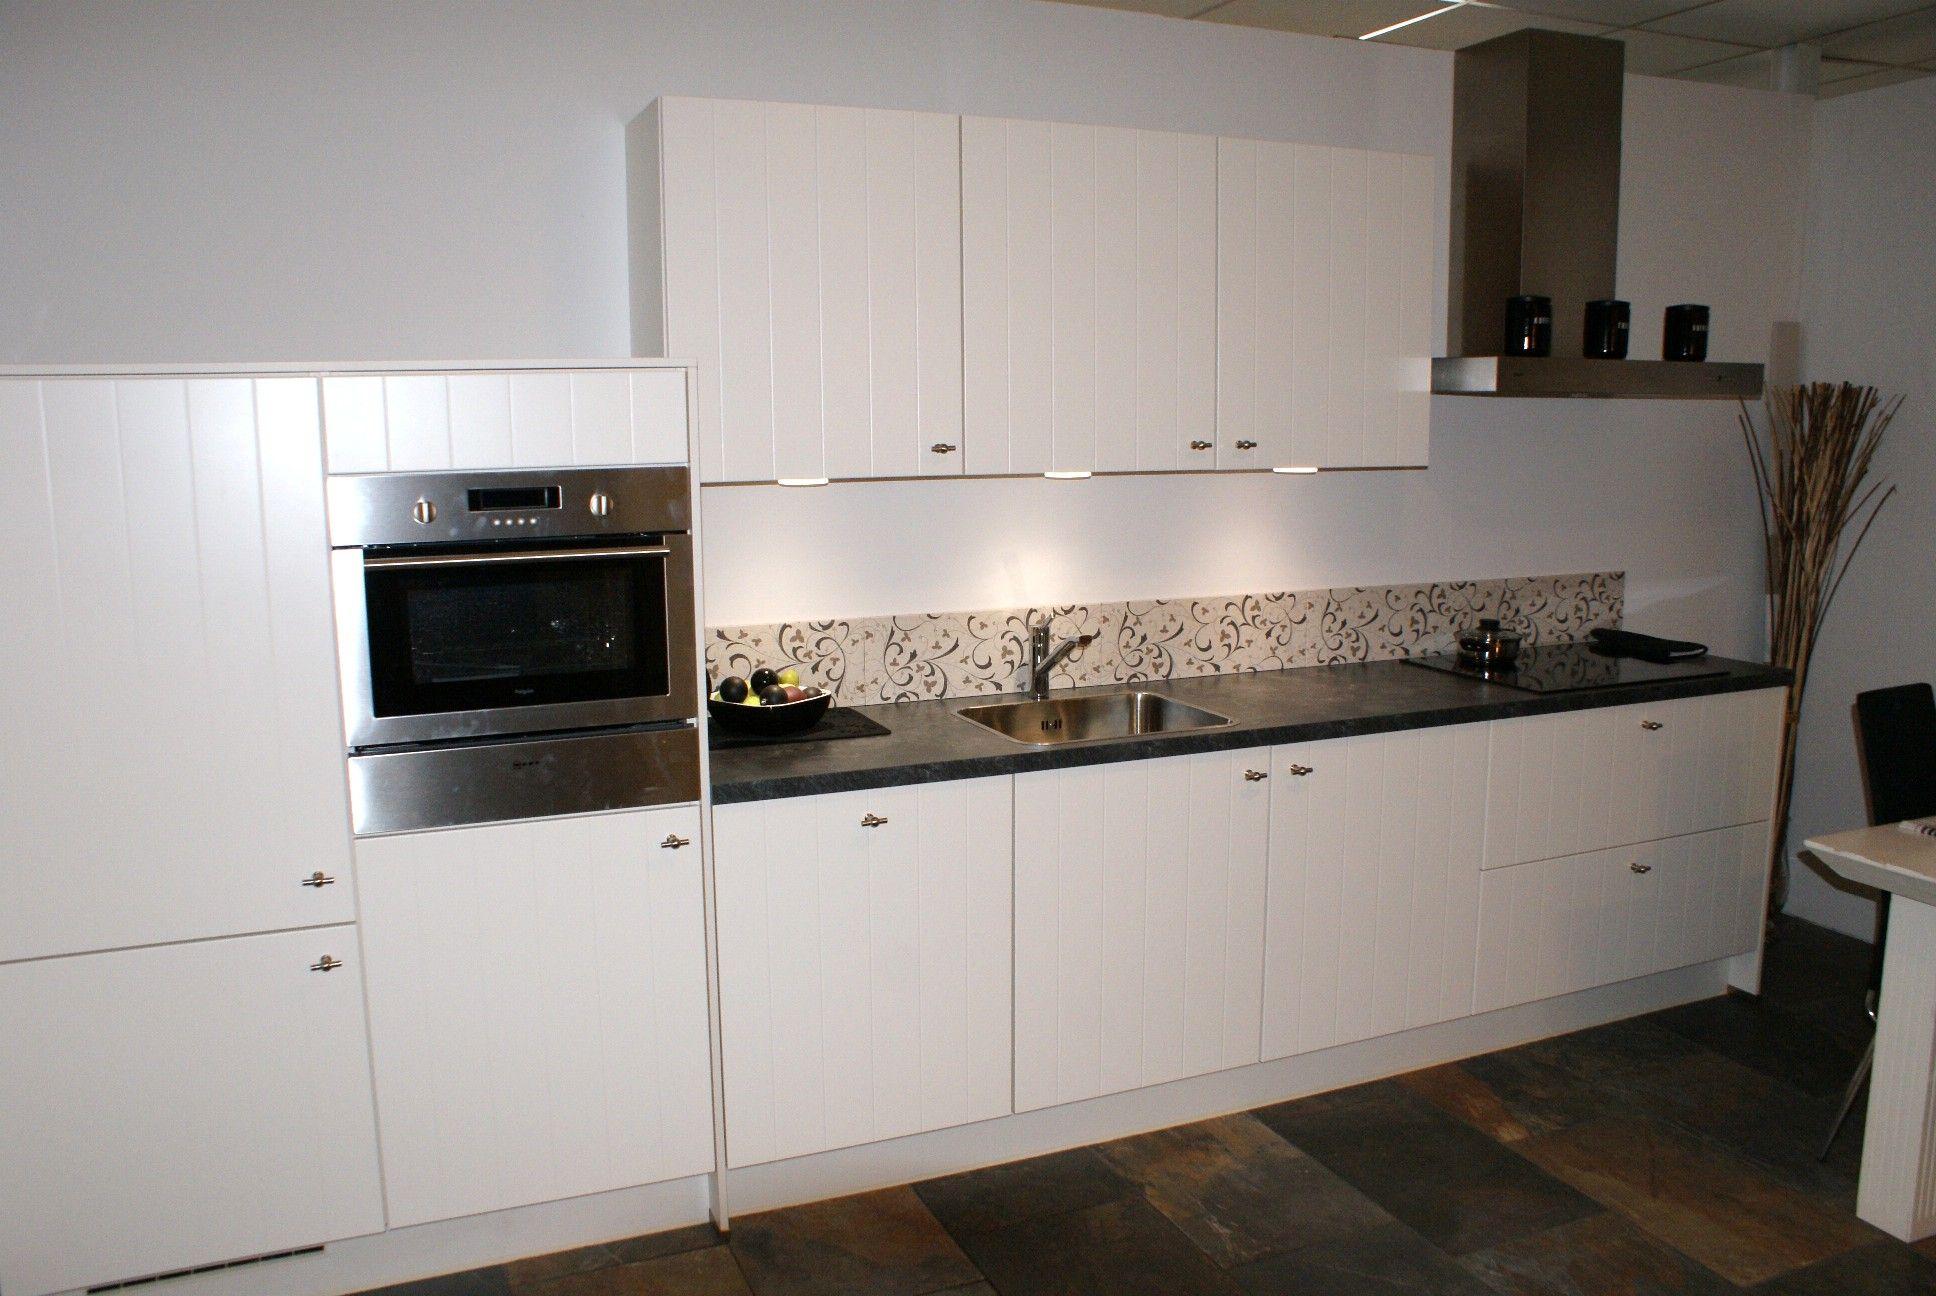 Kleur Keuken Tegels : Magnolia keuken welke kleur vloer. simple re archief kleuradvies